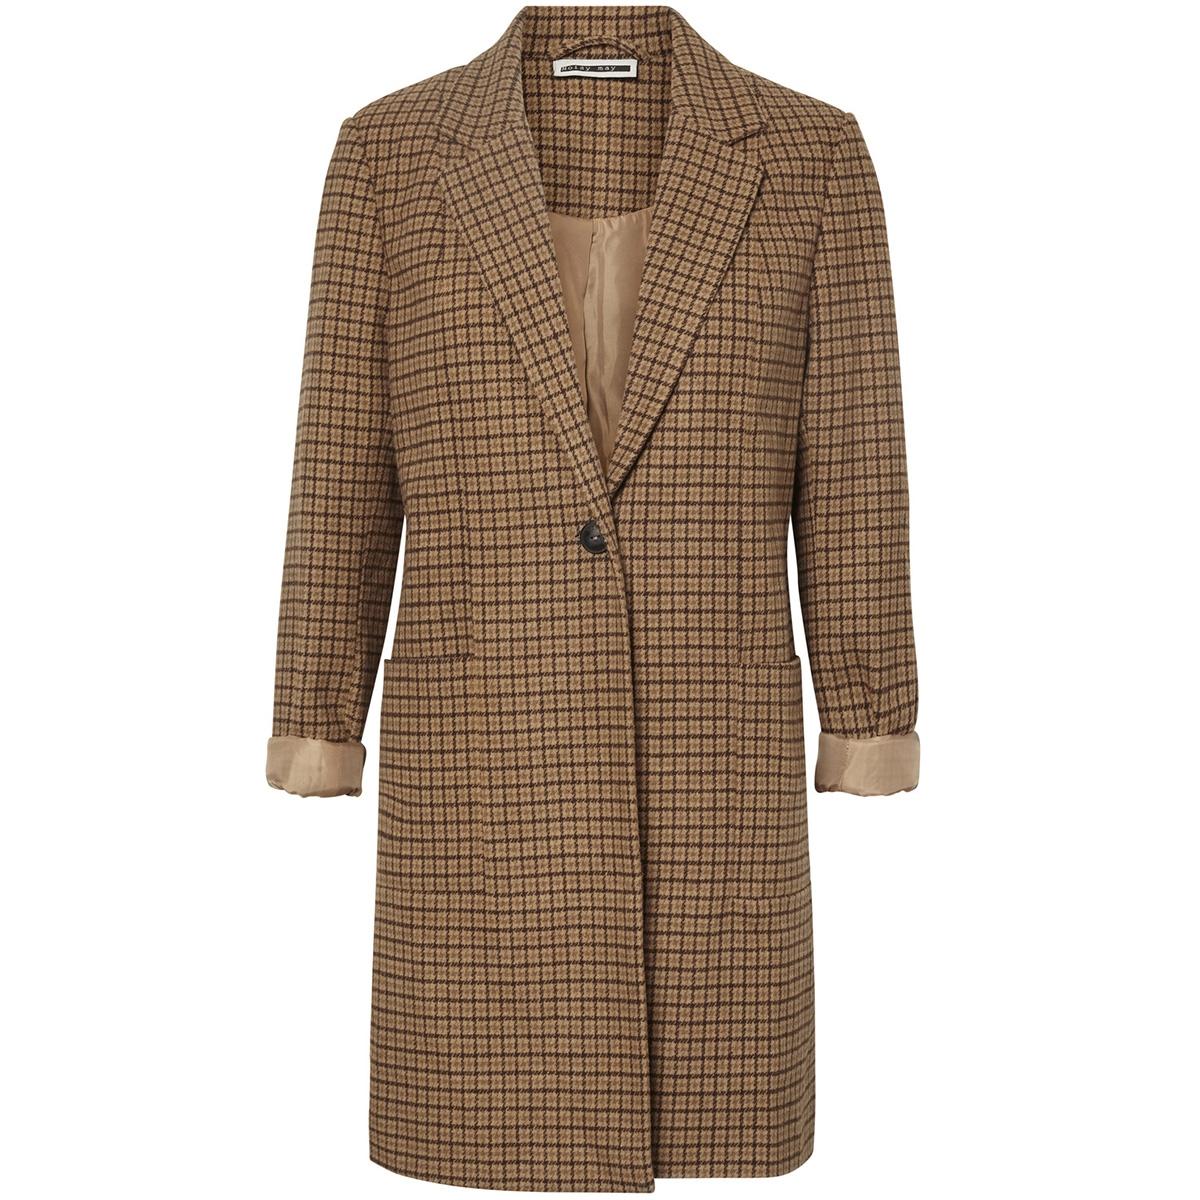 nmjohnny l/s coat rep 27006343 noisy may jas tobacco brown/dark brown